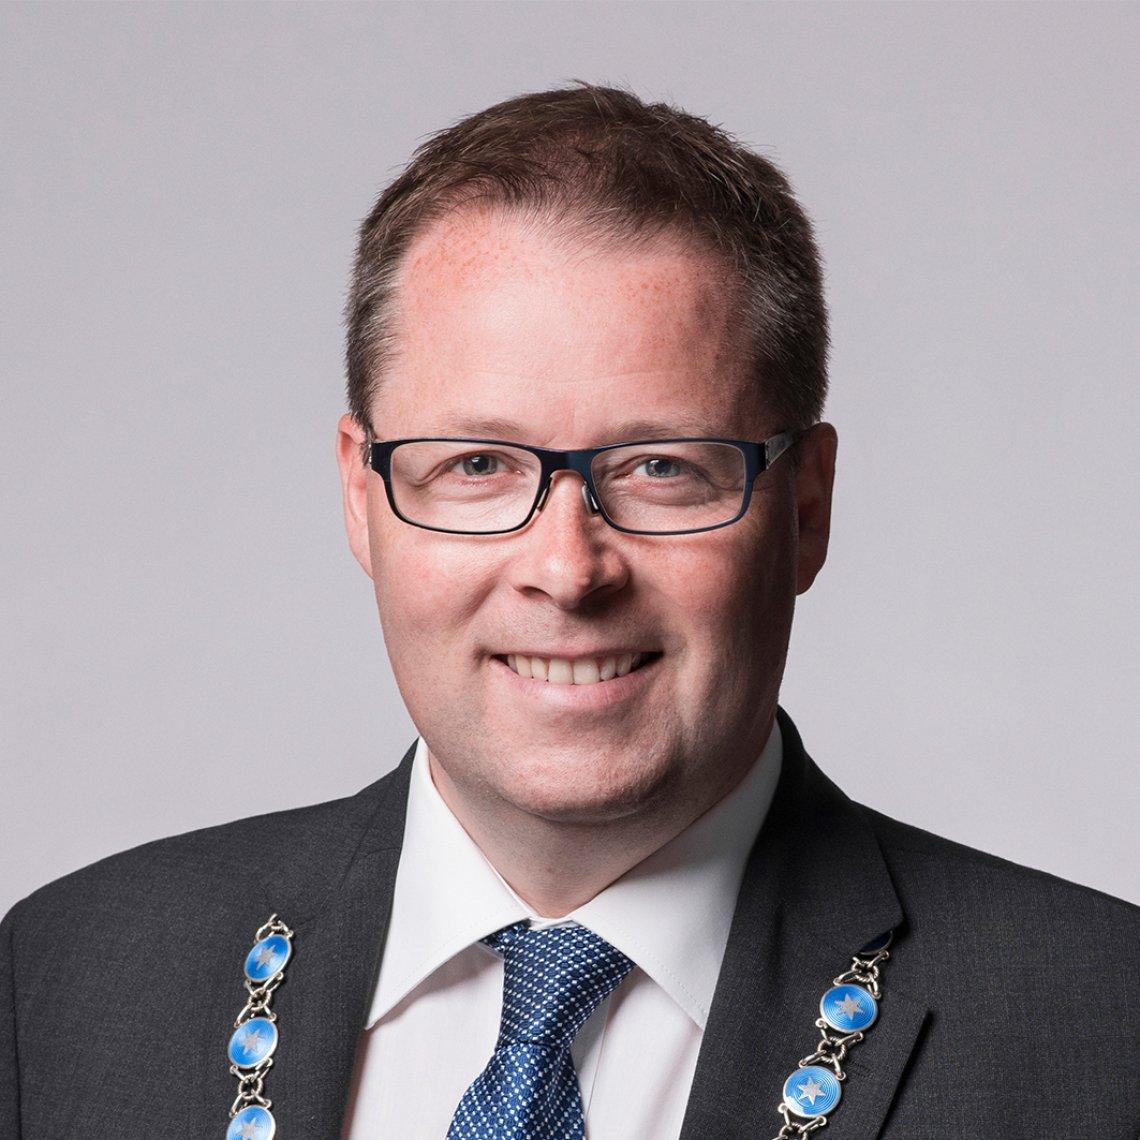 Bjørn Arild Gram ny styreleder i KS